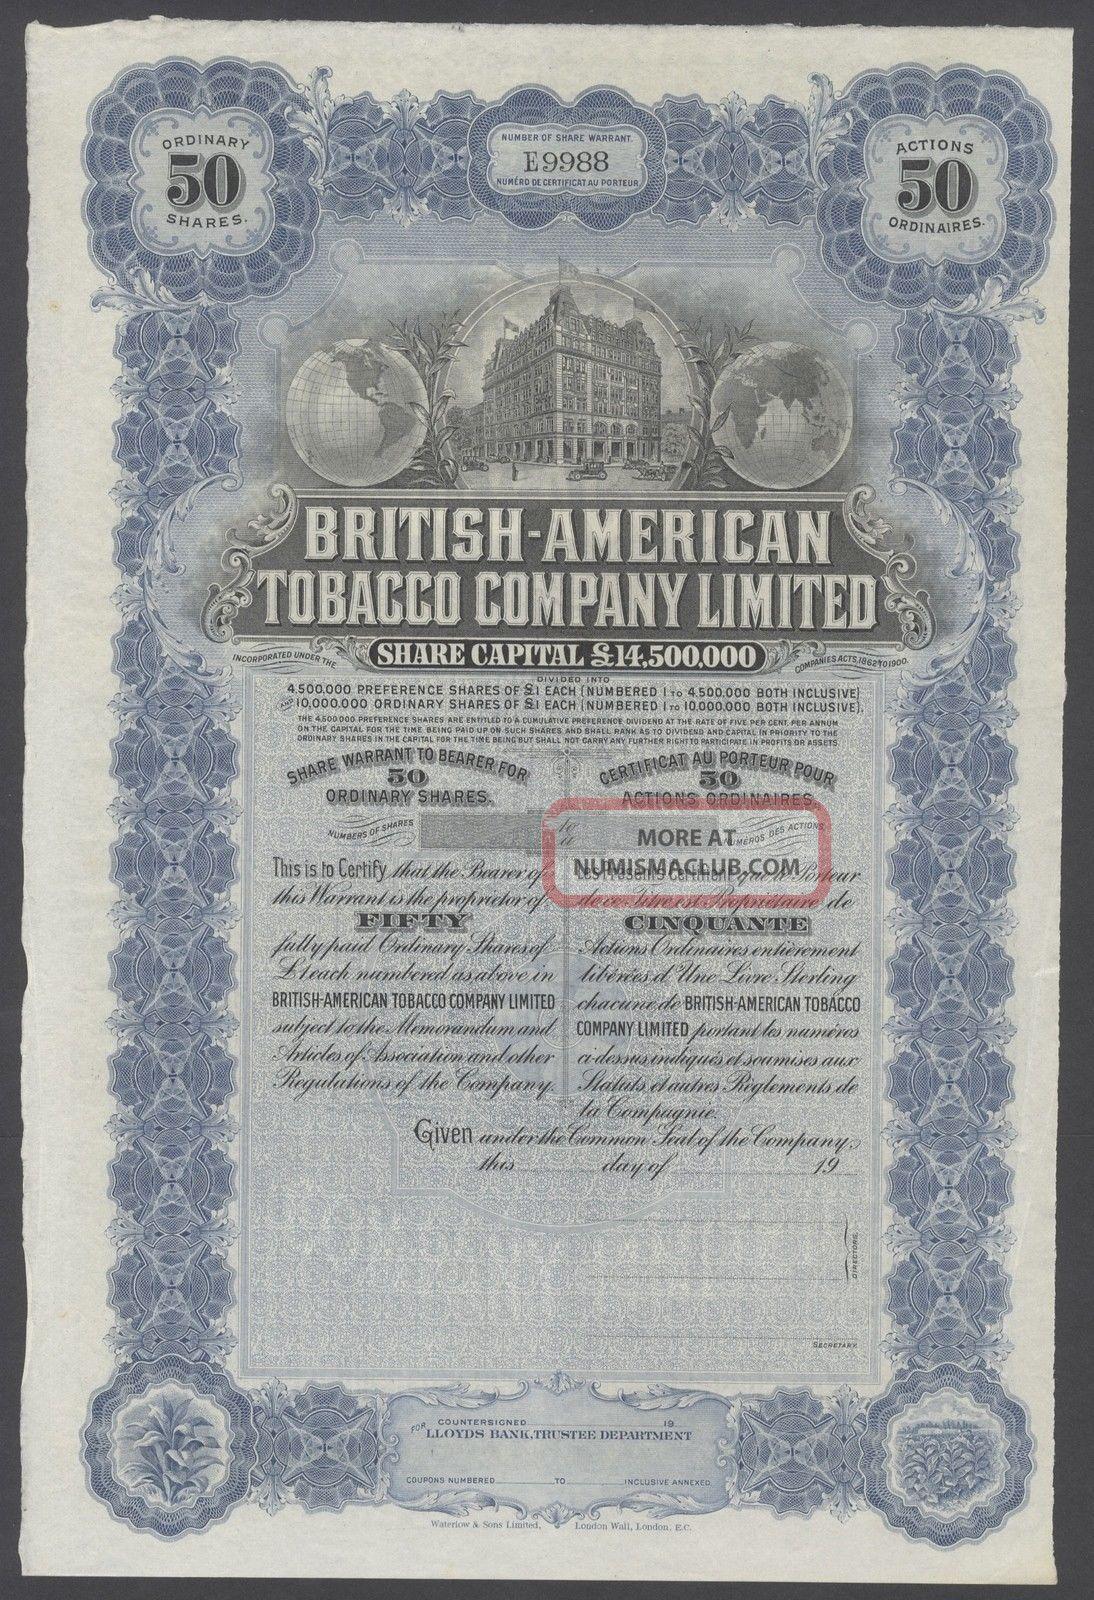 United States 1900s Uncirculated Ornate Bond British - American Tobacco Co.  R3336 World photo